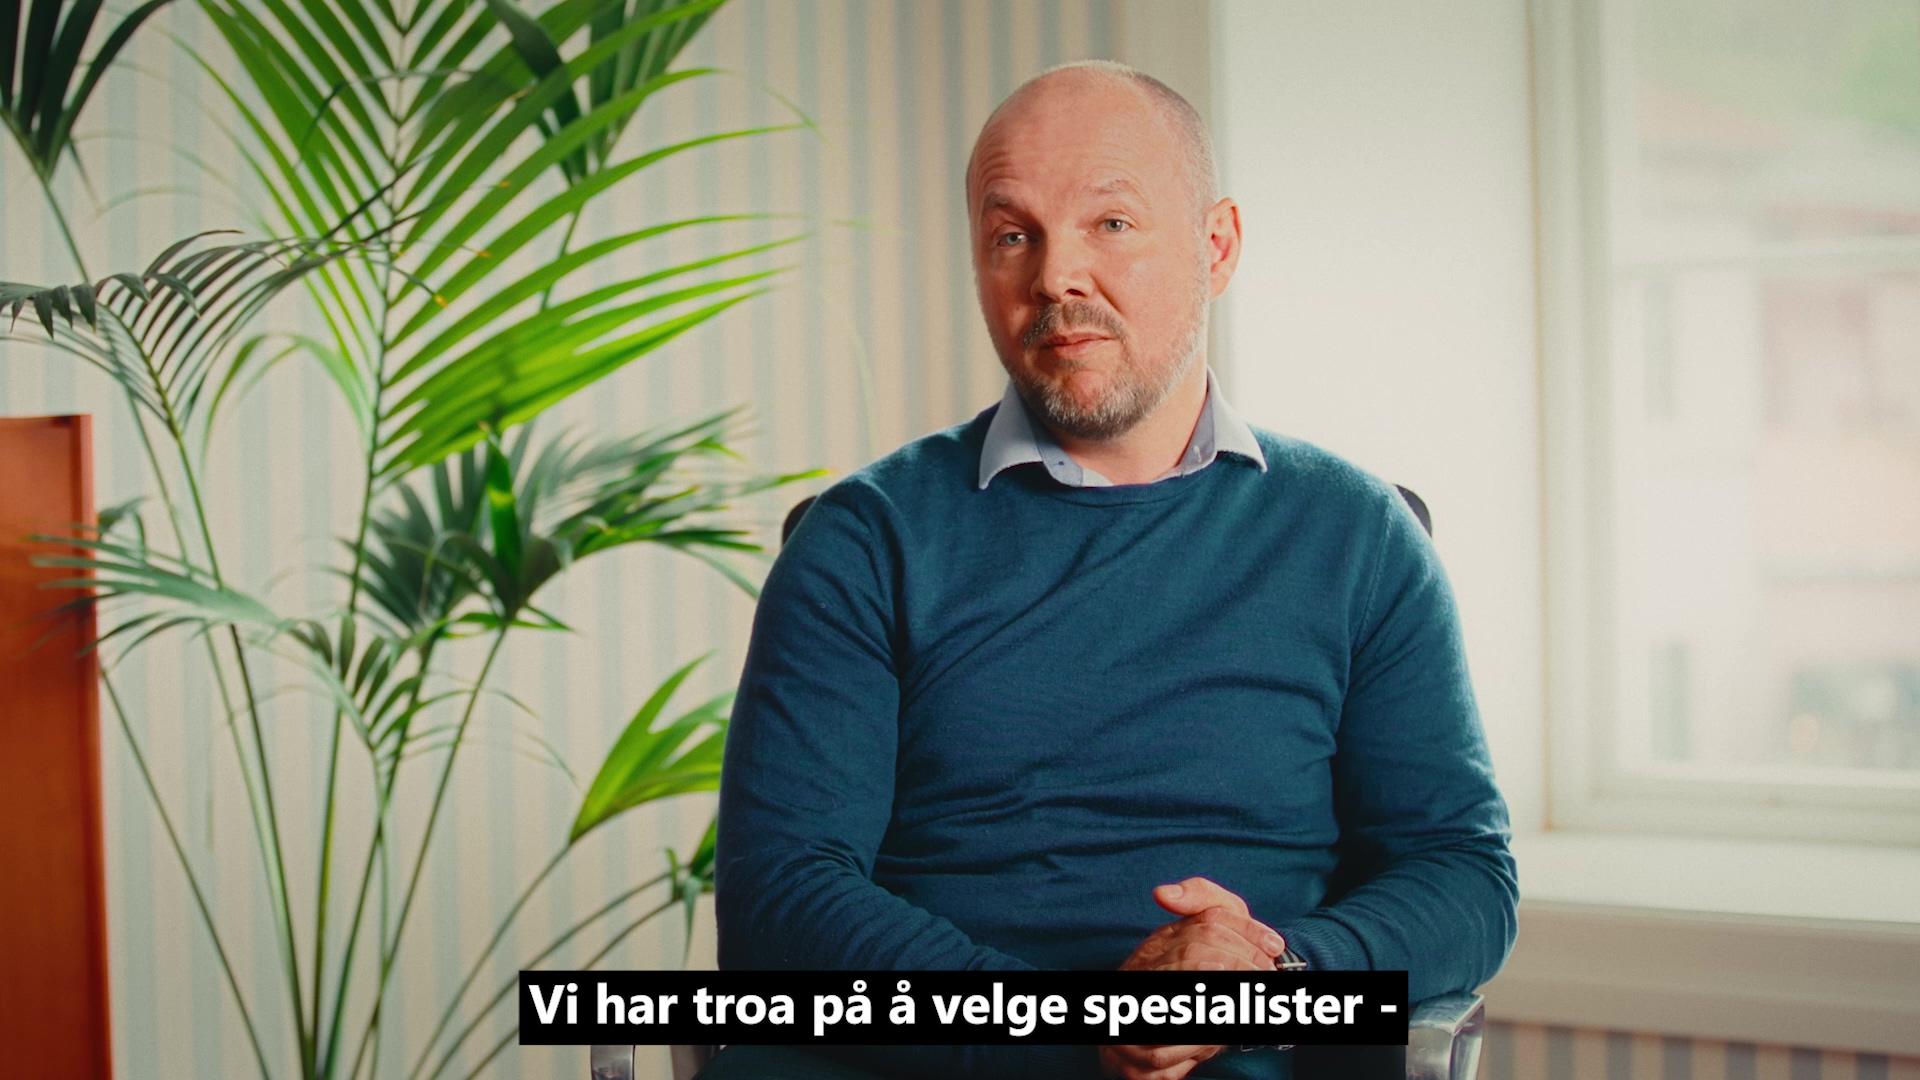 CLOUD_SERVICES_HALDEN_communicate_MASTER_16x9_NORSK